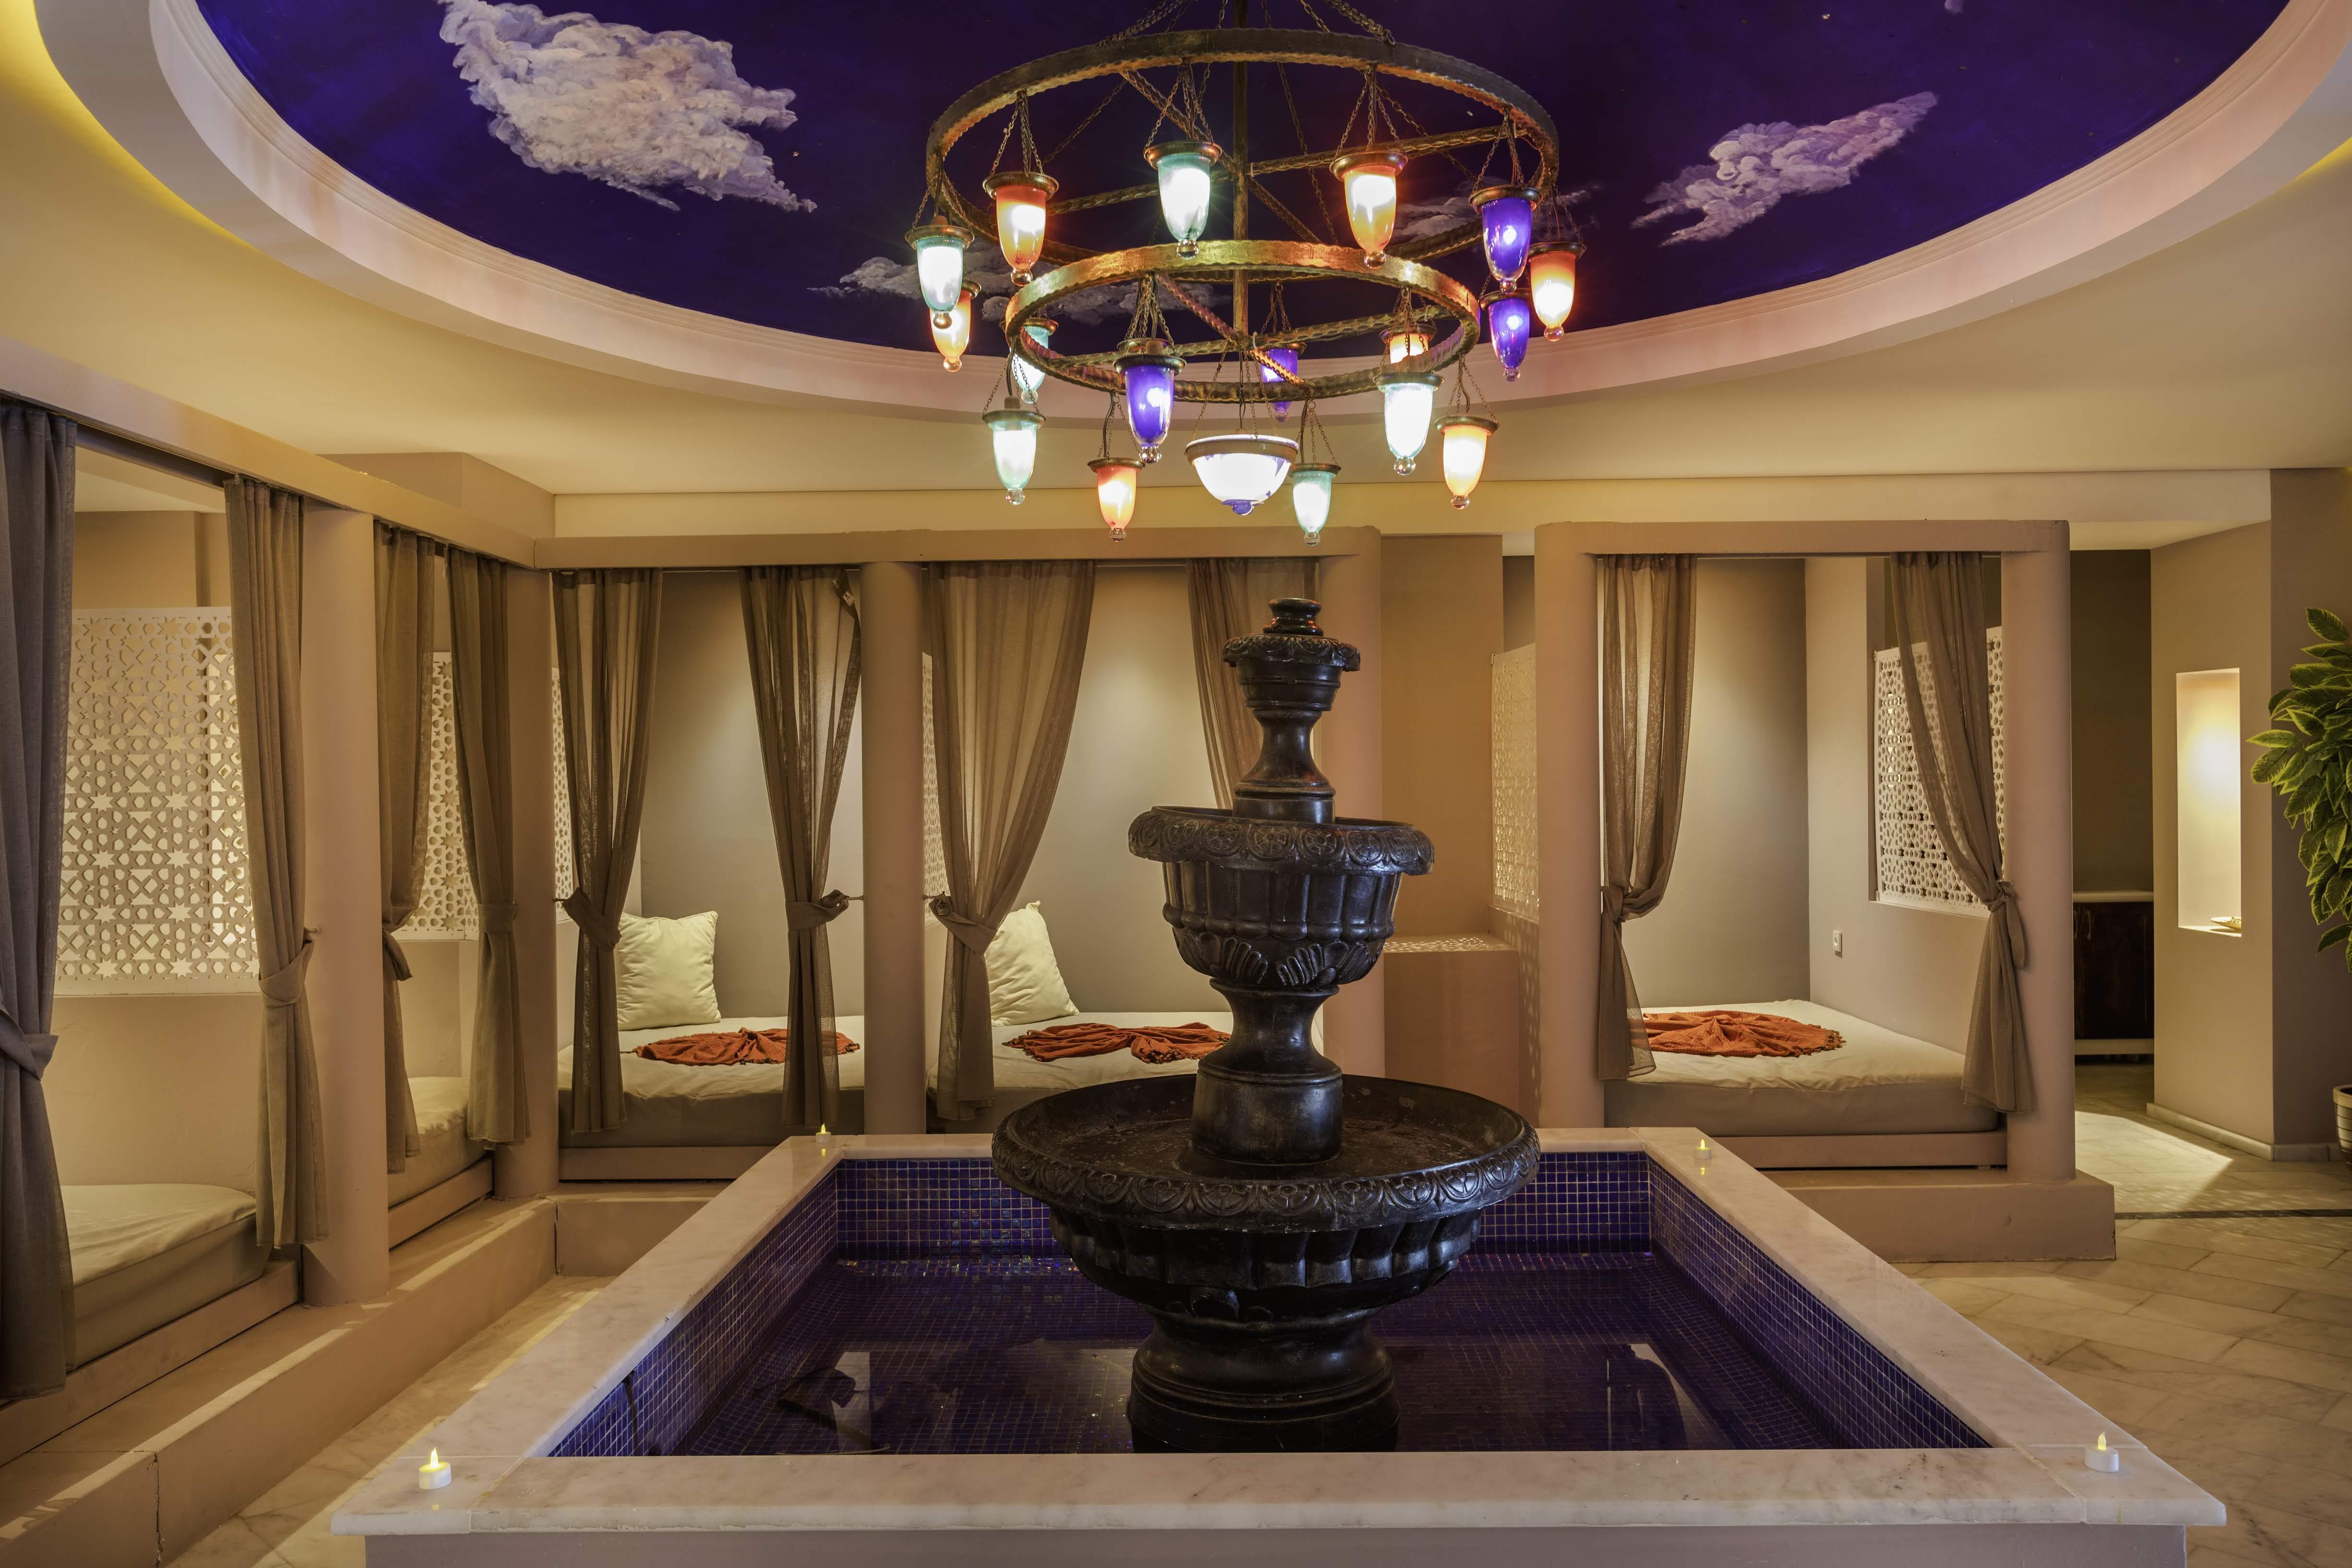 kairaba-blue-dreams-club-hotel-genel-0018